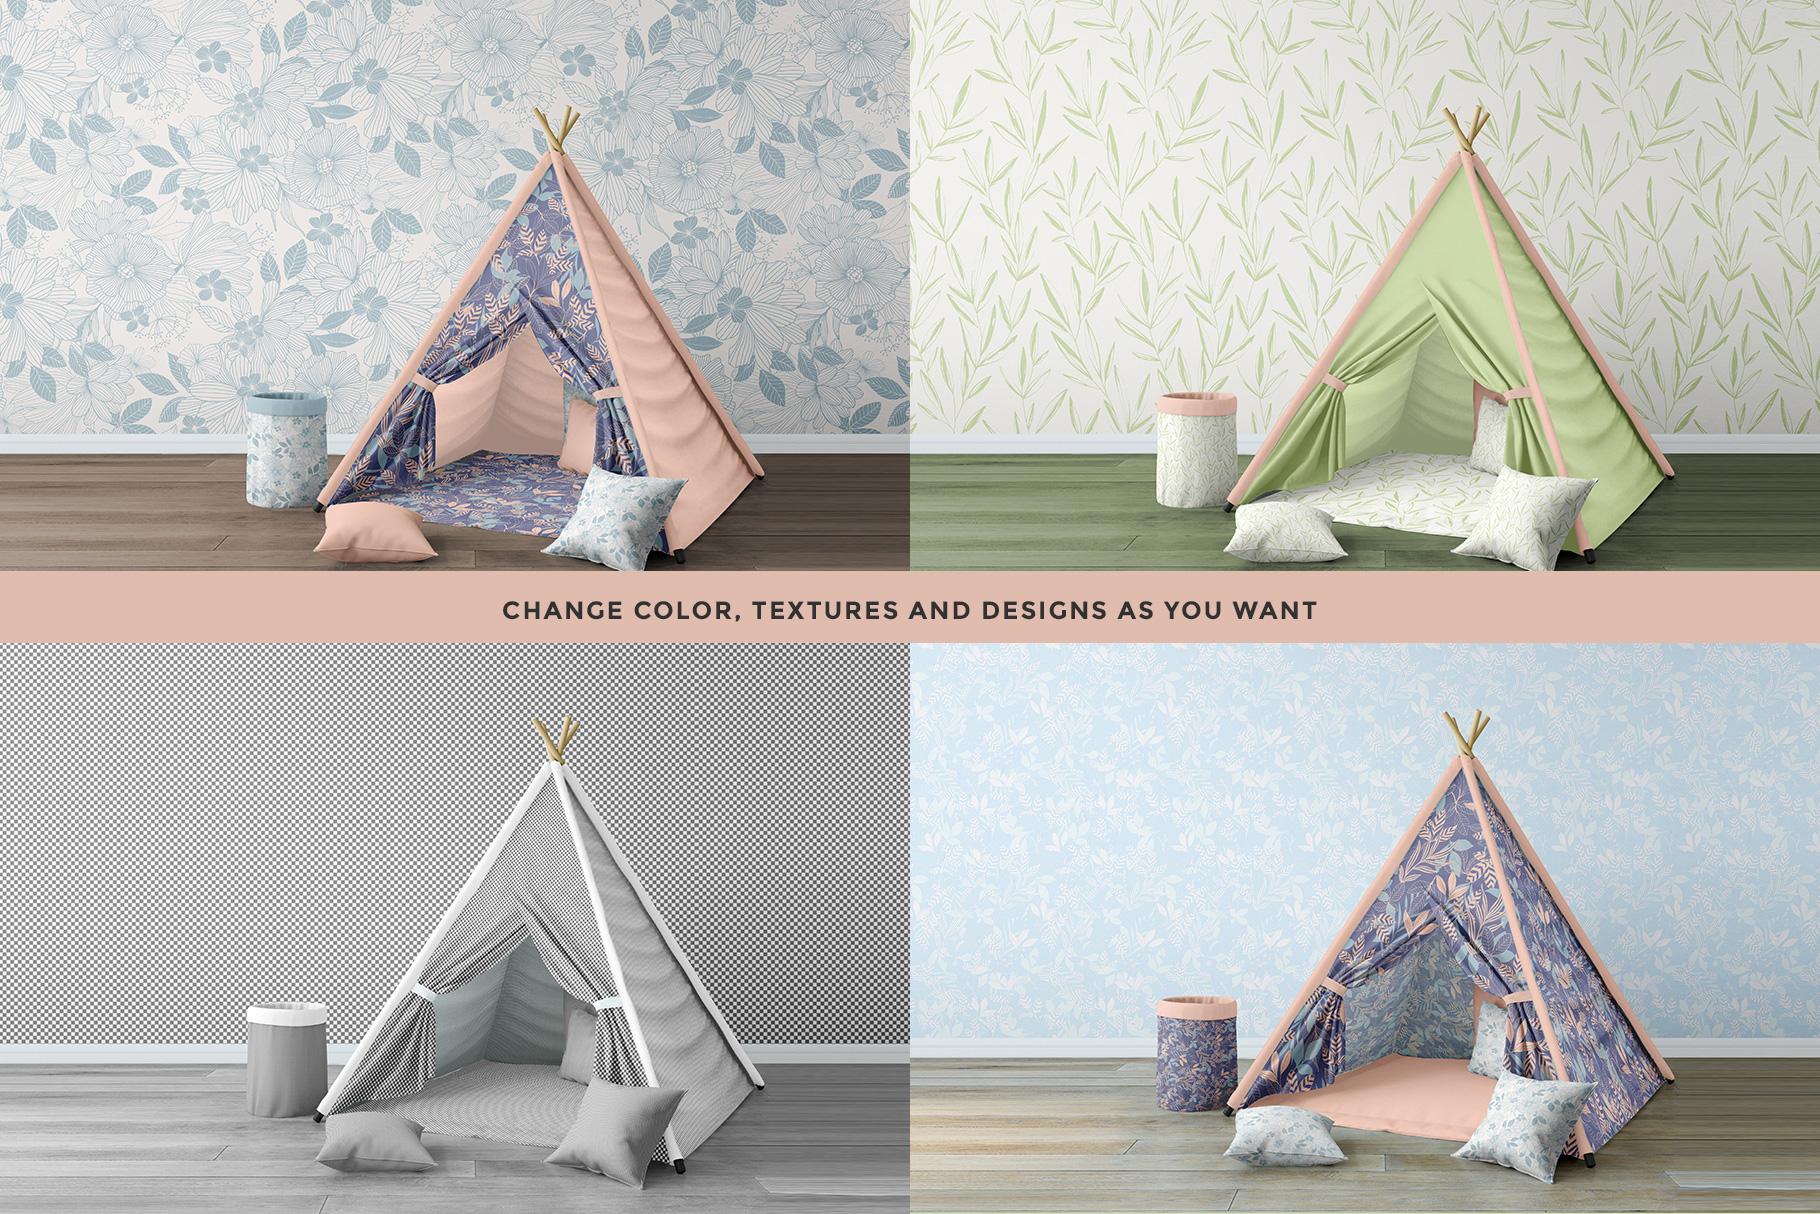 design variations of the infant playroom interior mockup